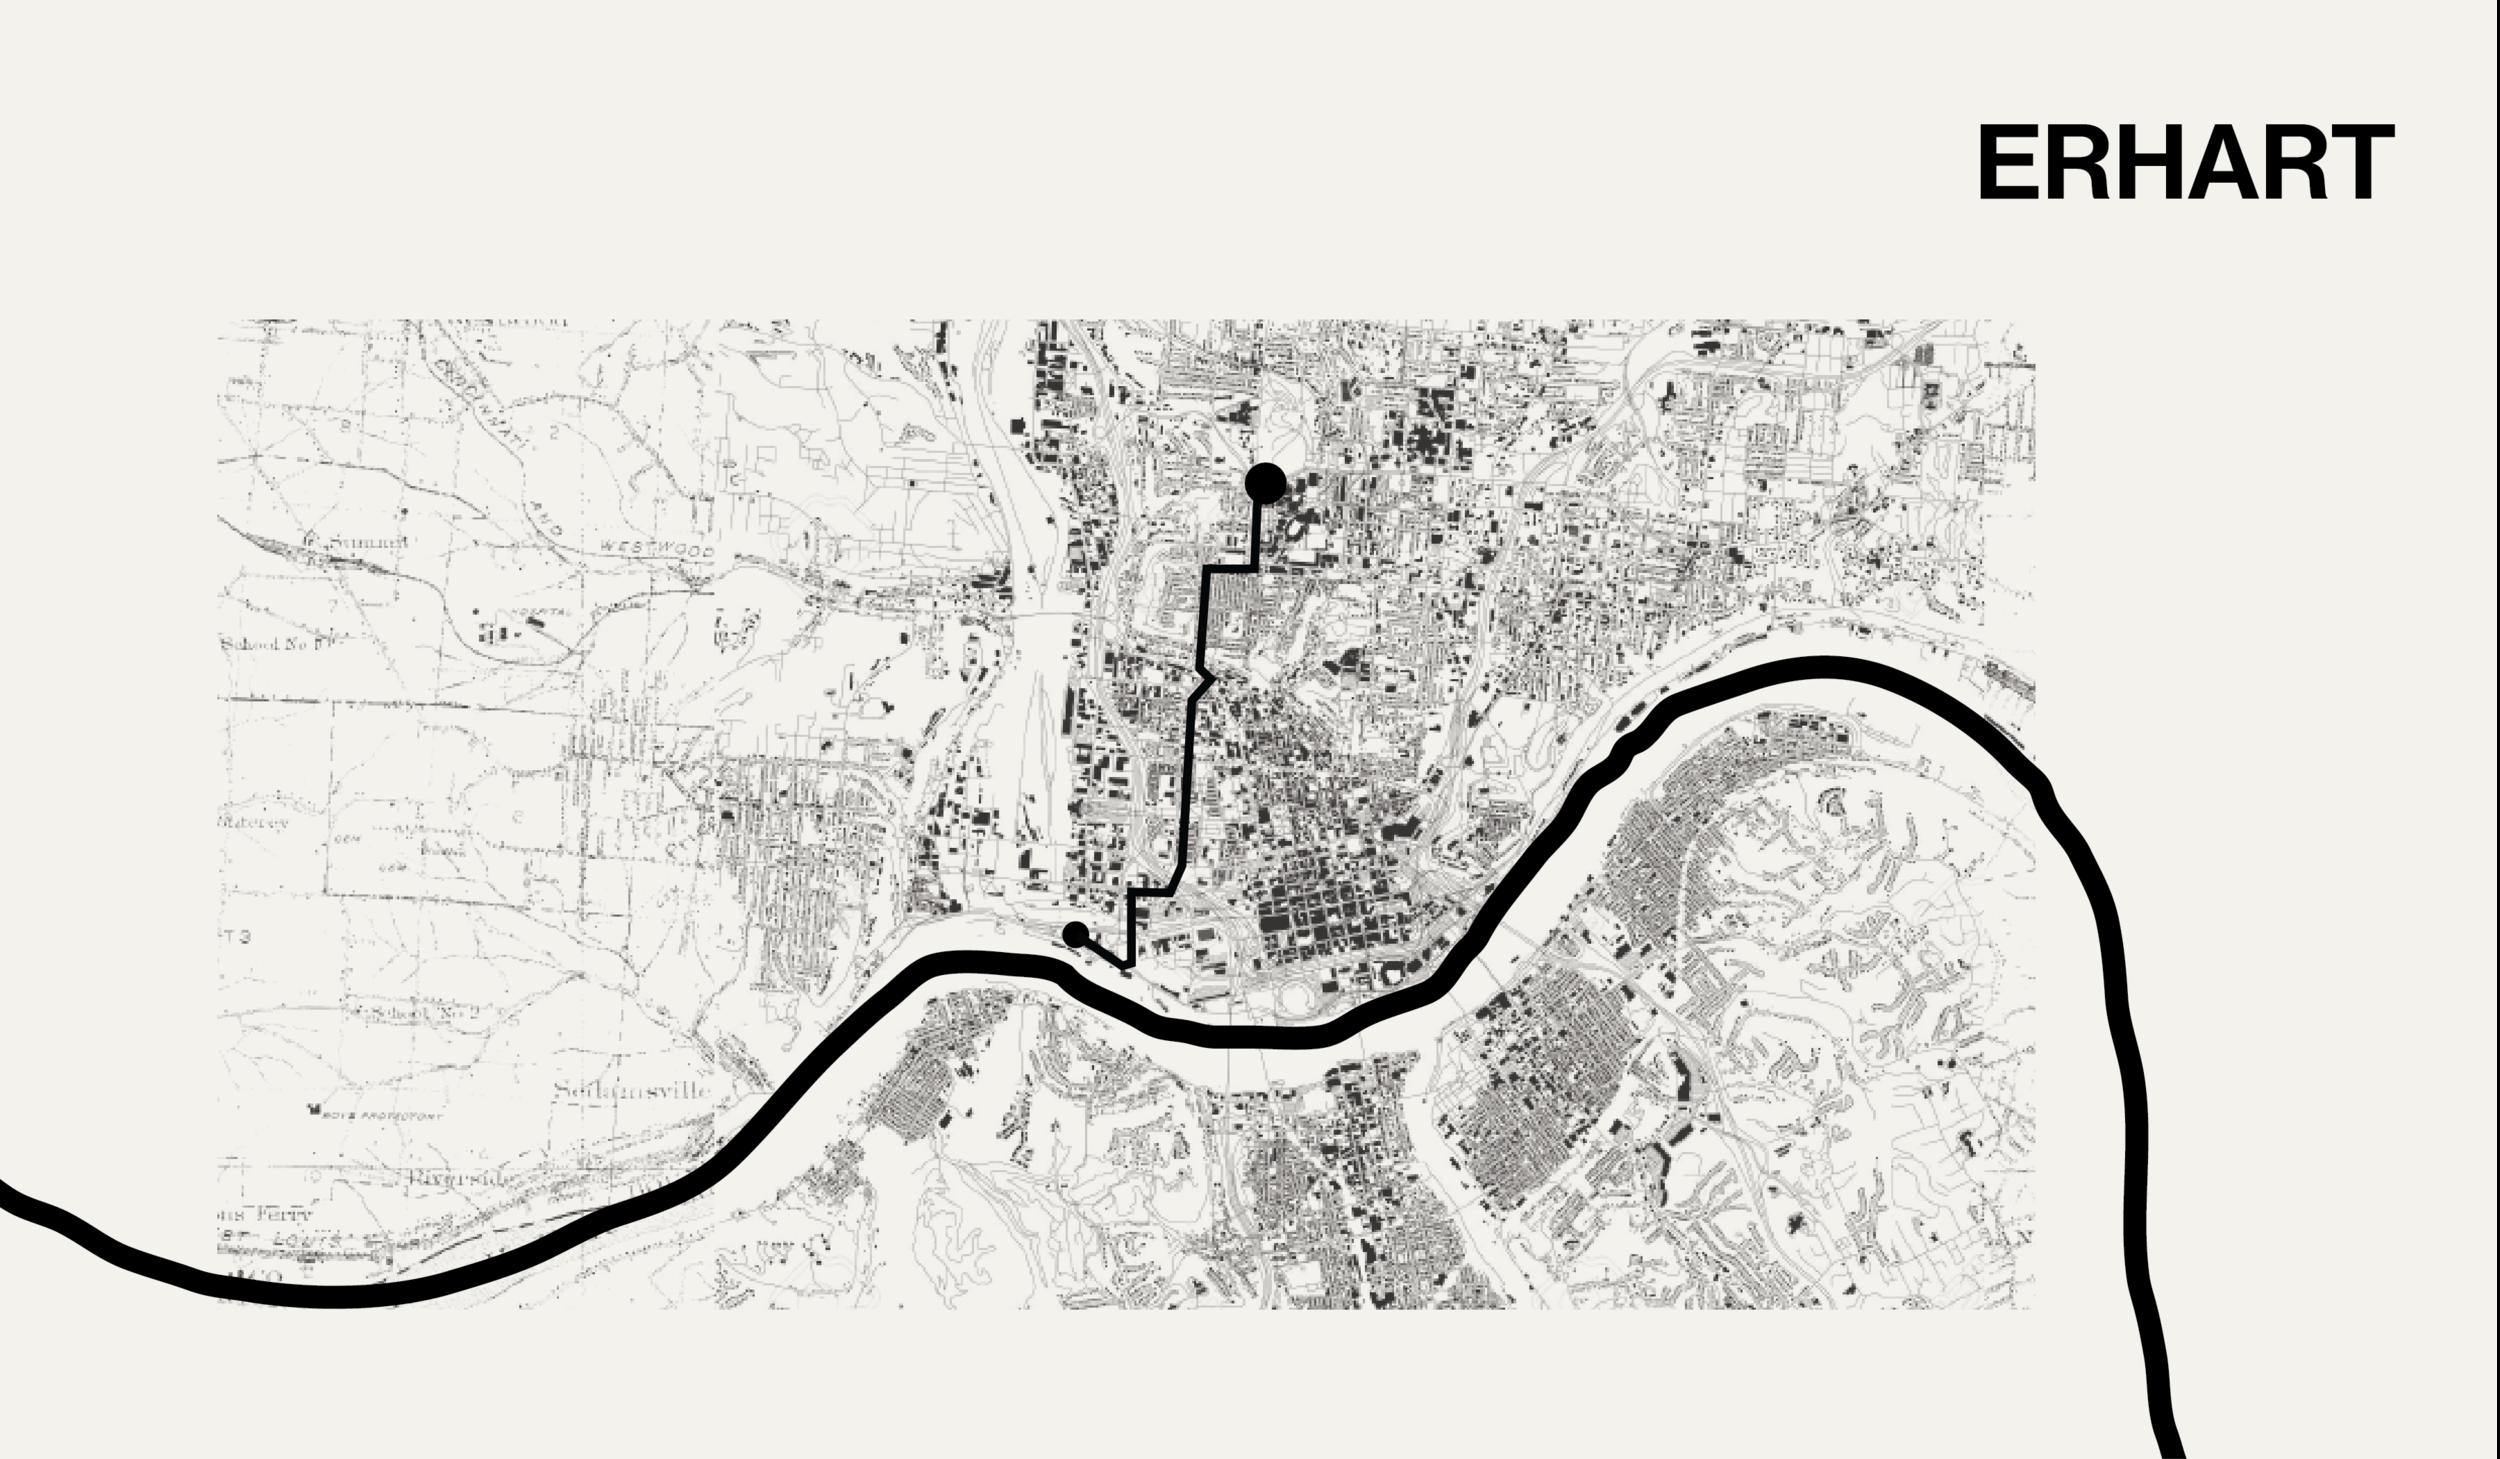 Map-Erhart.png